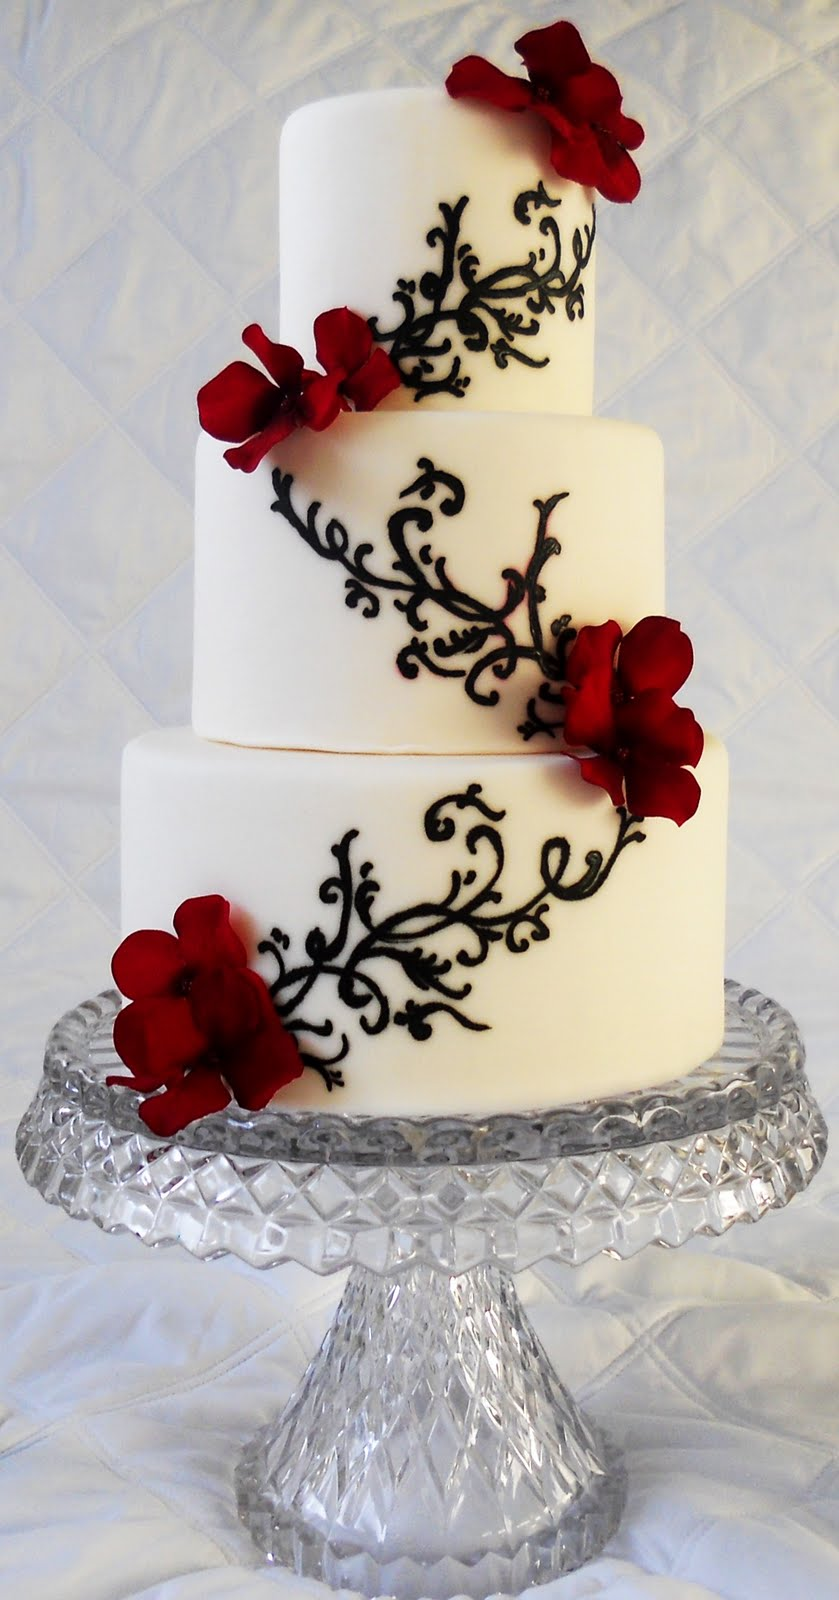 Birthday Cake Designs – Page 28 – Birthday cake designs by name